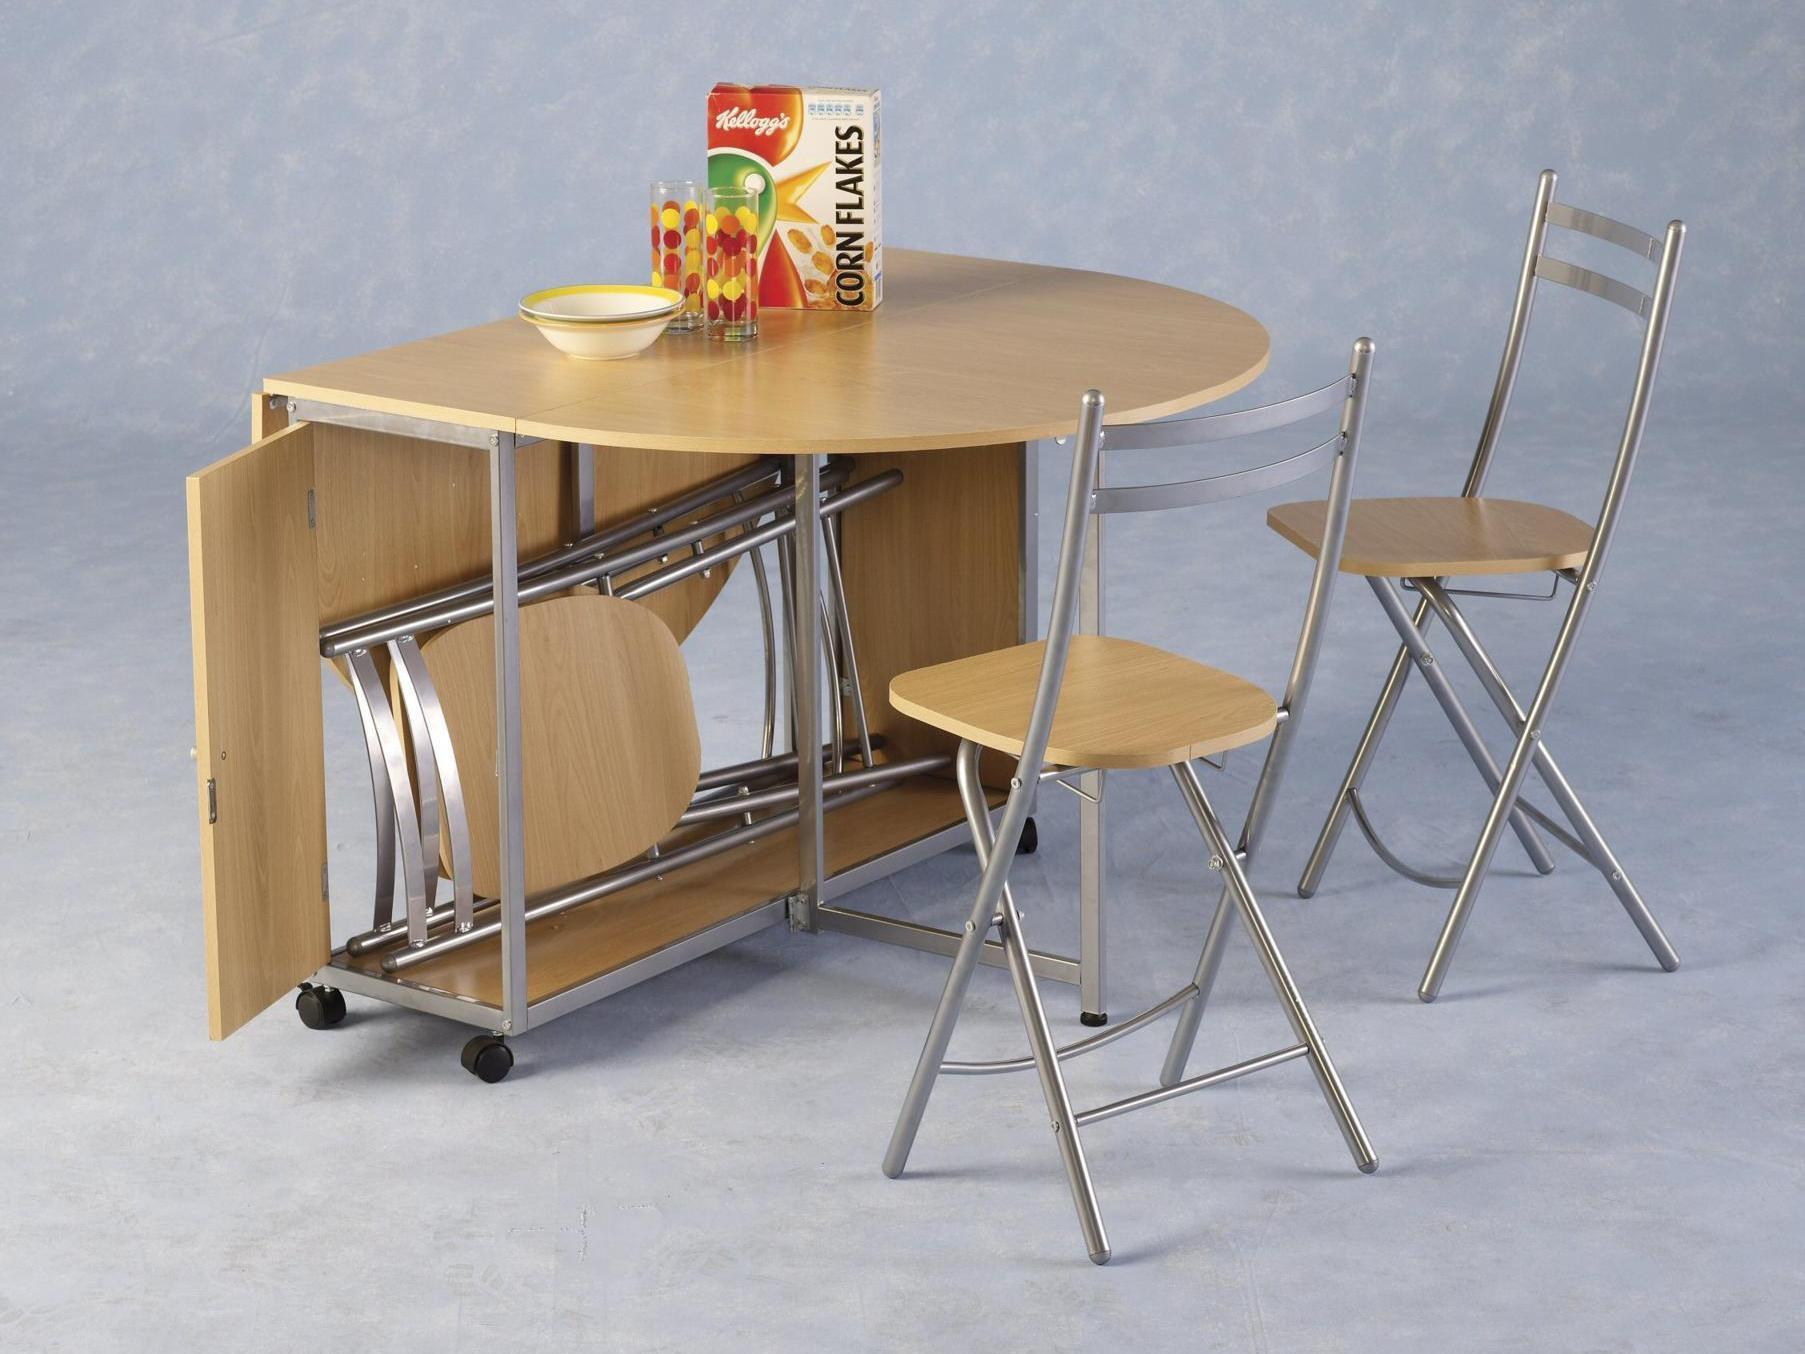 Стол стул для кухни своими руками